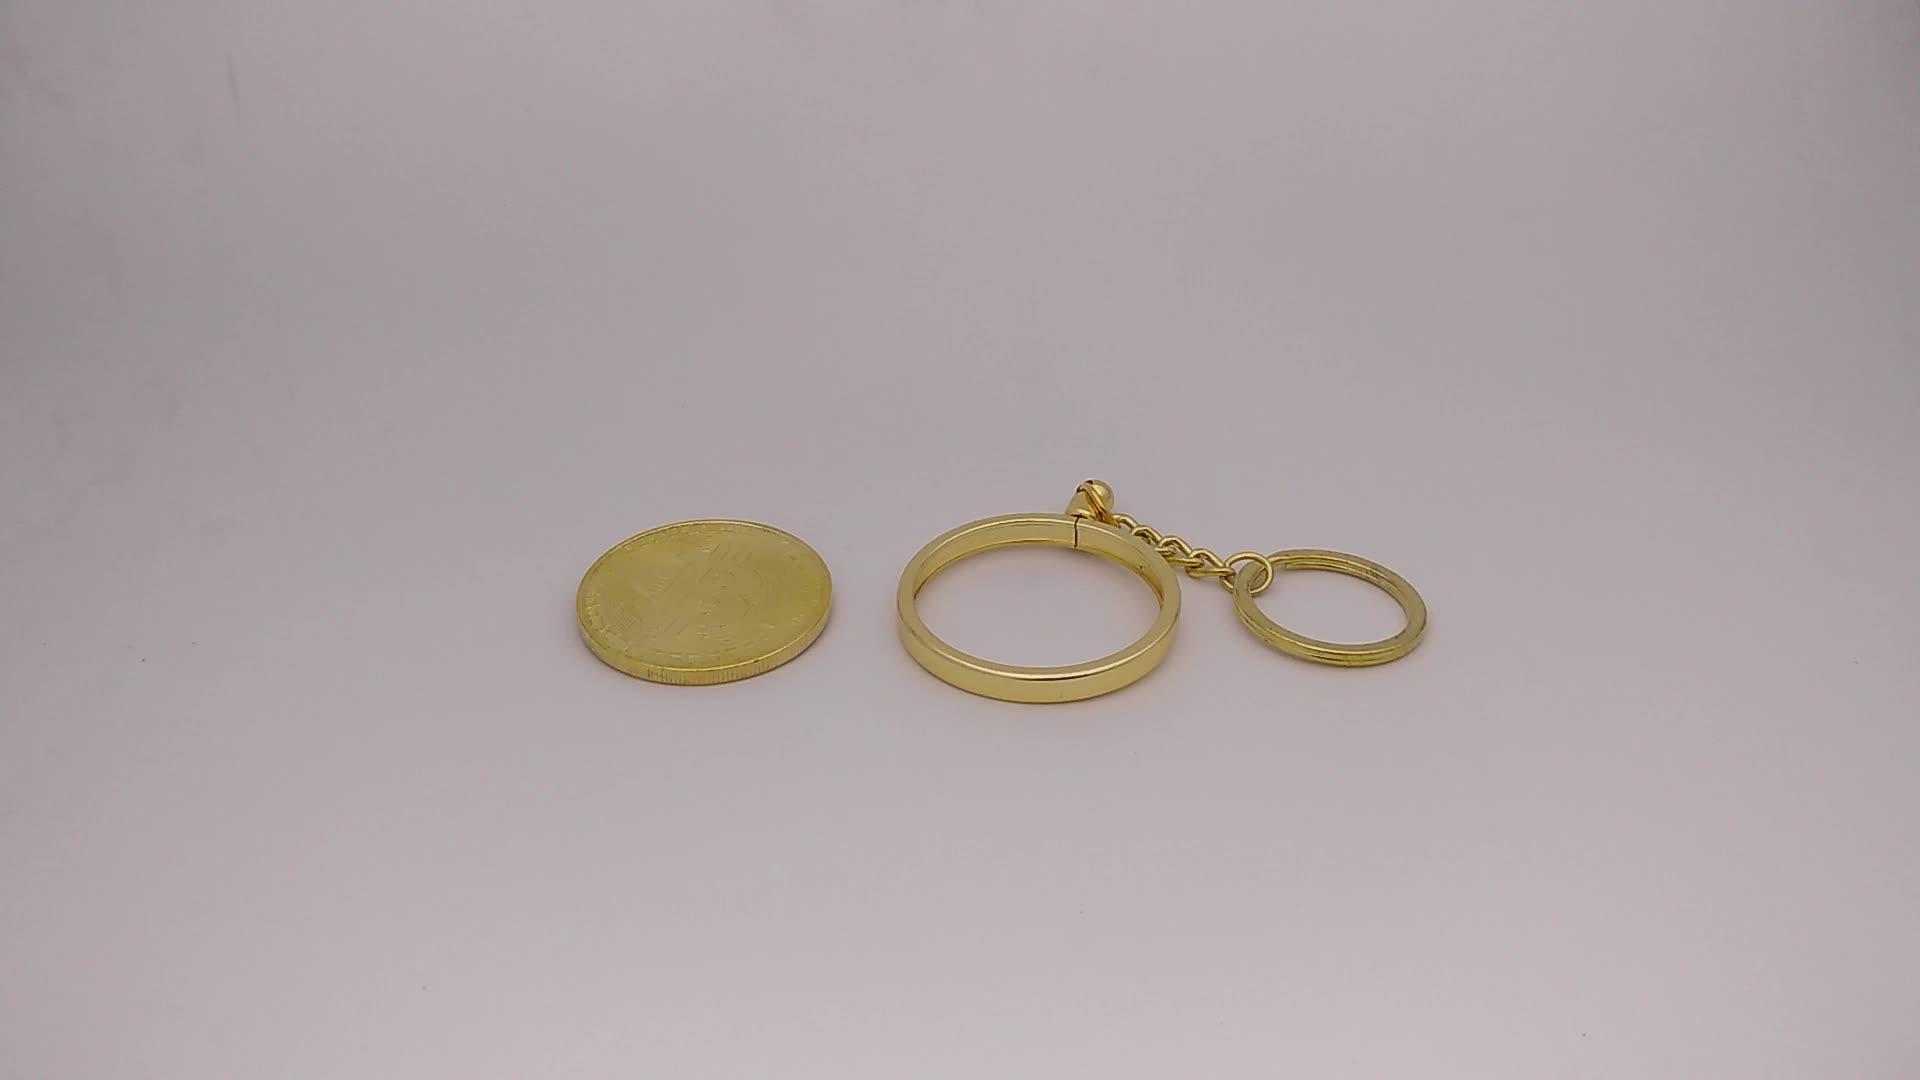 Custom metal coin bezel bitcoin coin holder keychain